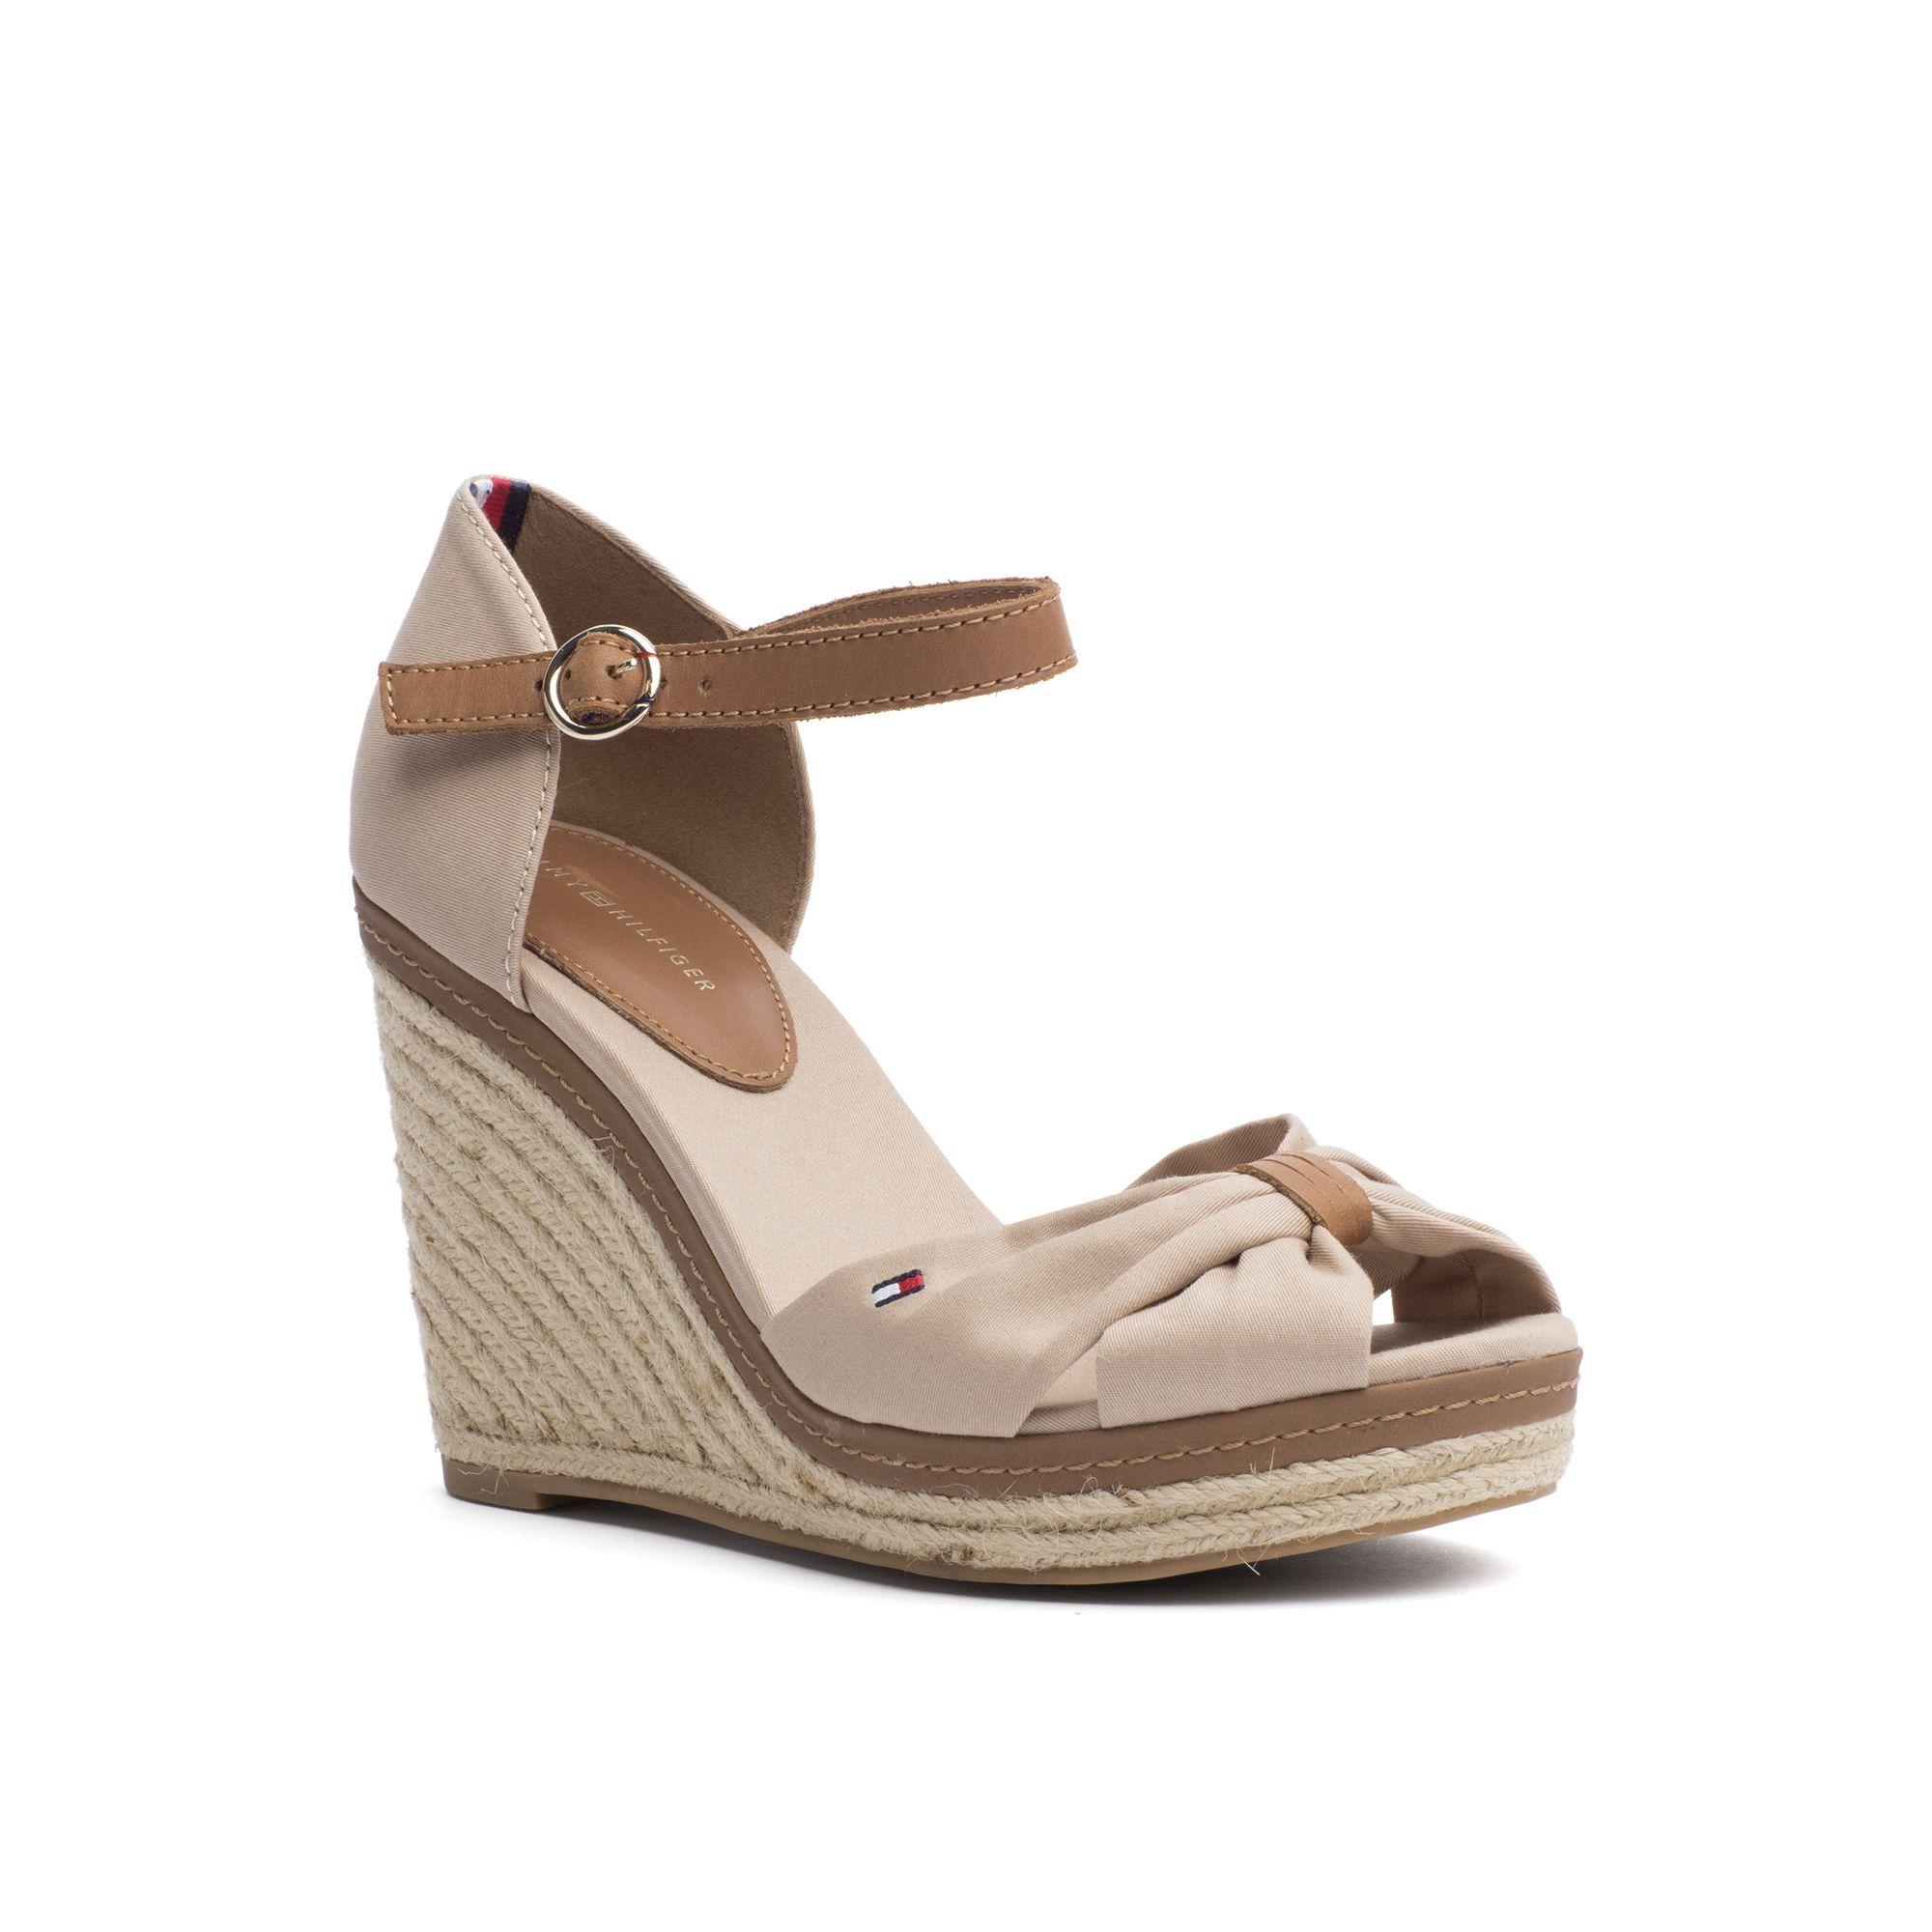 7a80b3f60942 TOMMY HILFIGER PEEP TOE ESPADRILLE WEDGE - DESERT SAND.  tommyhilfiger   shoes